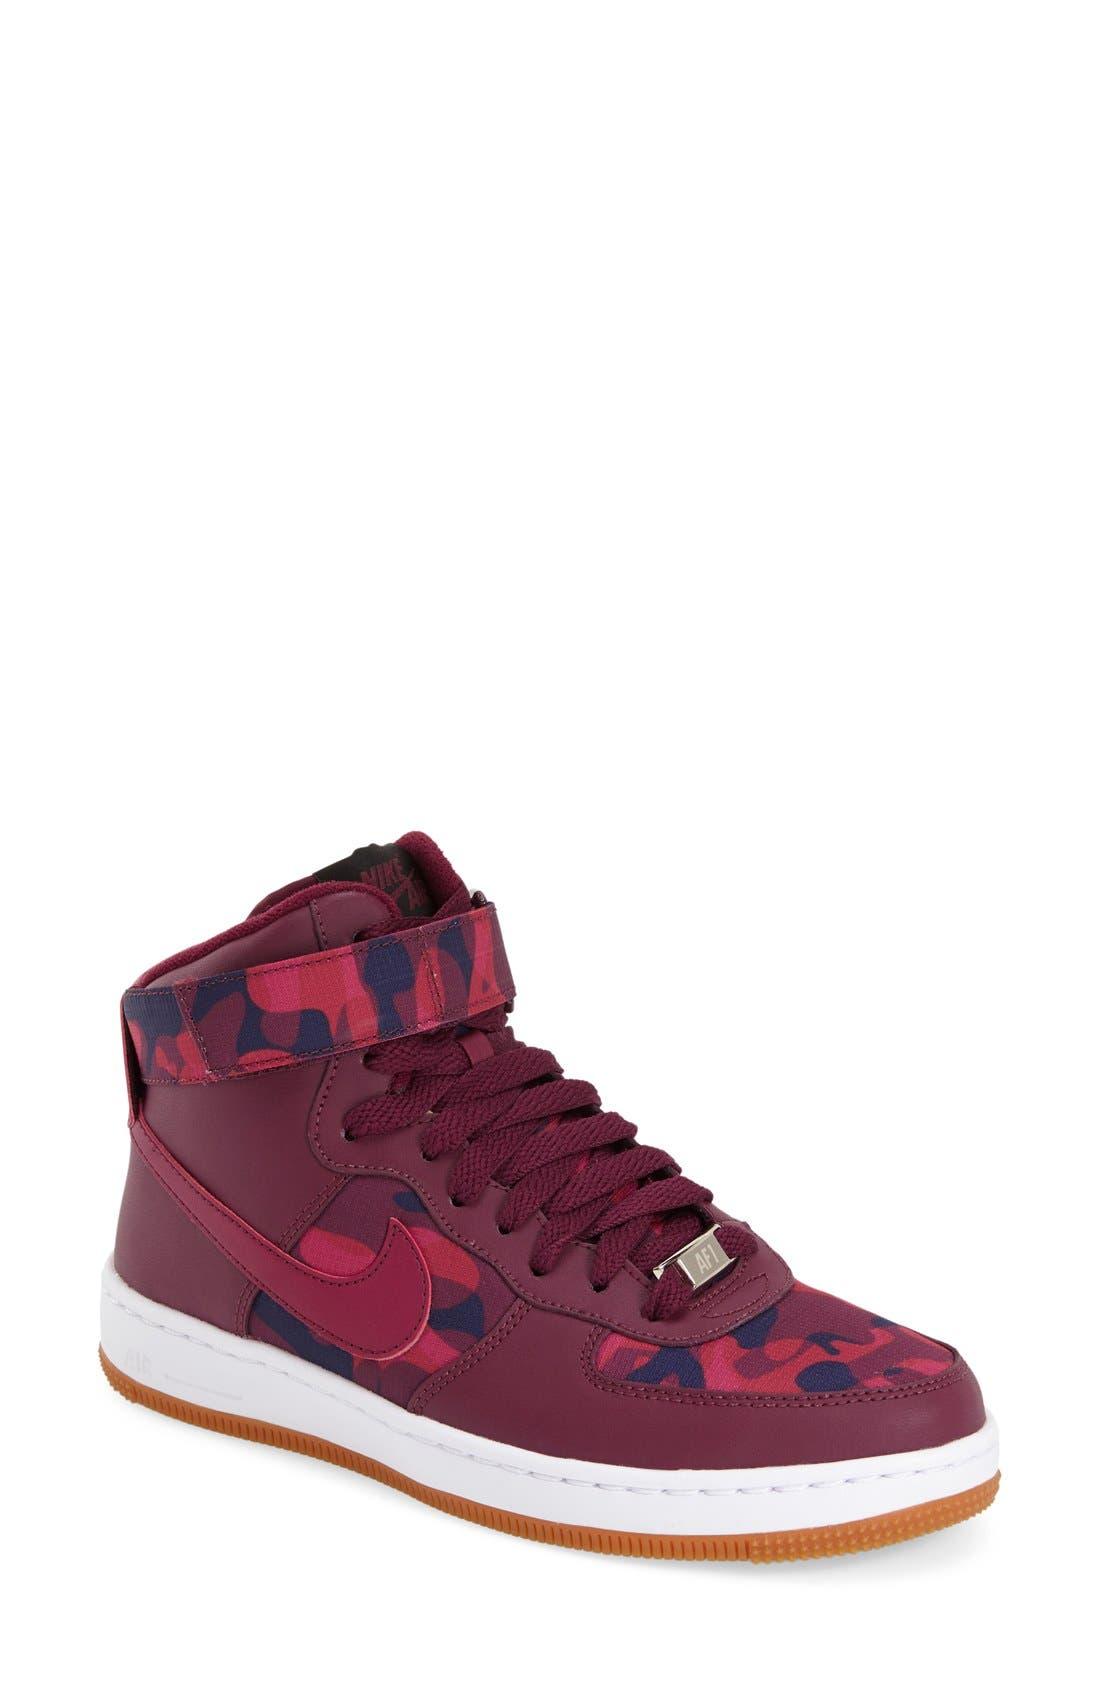 Alternate Image 1 Selected - Nike 'AF-1 Ultra Force' Sneaker (Women)